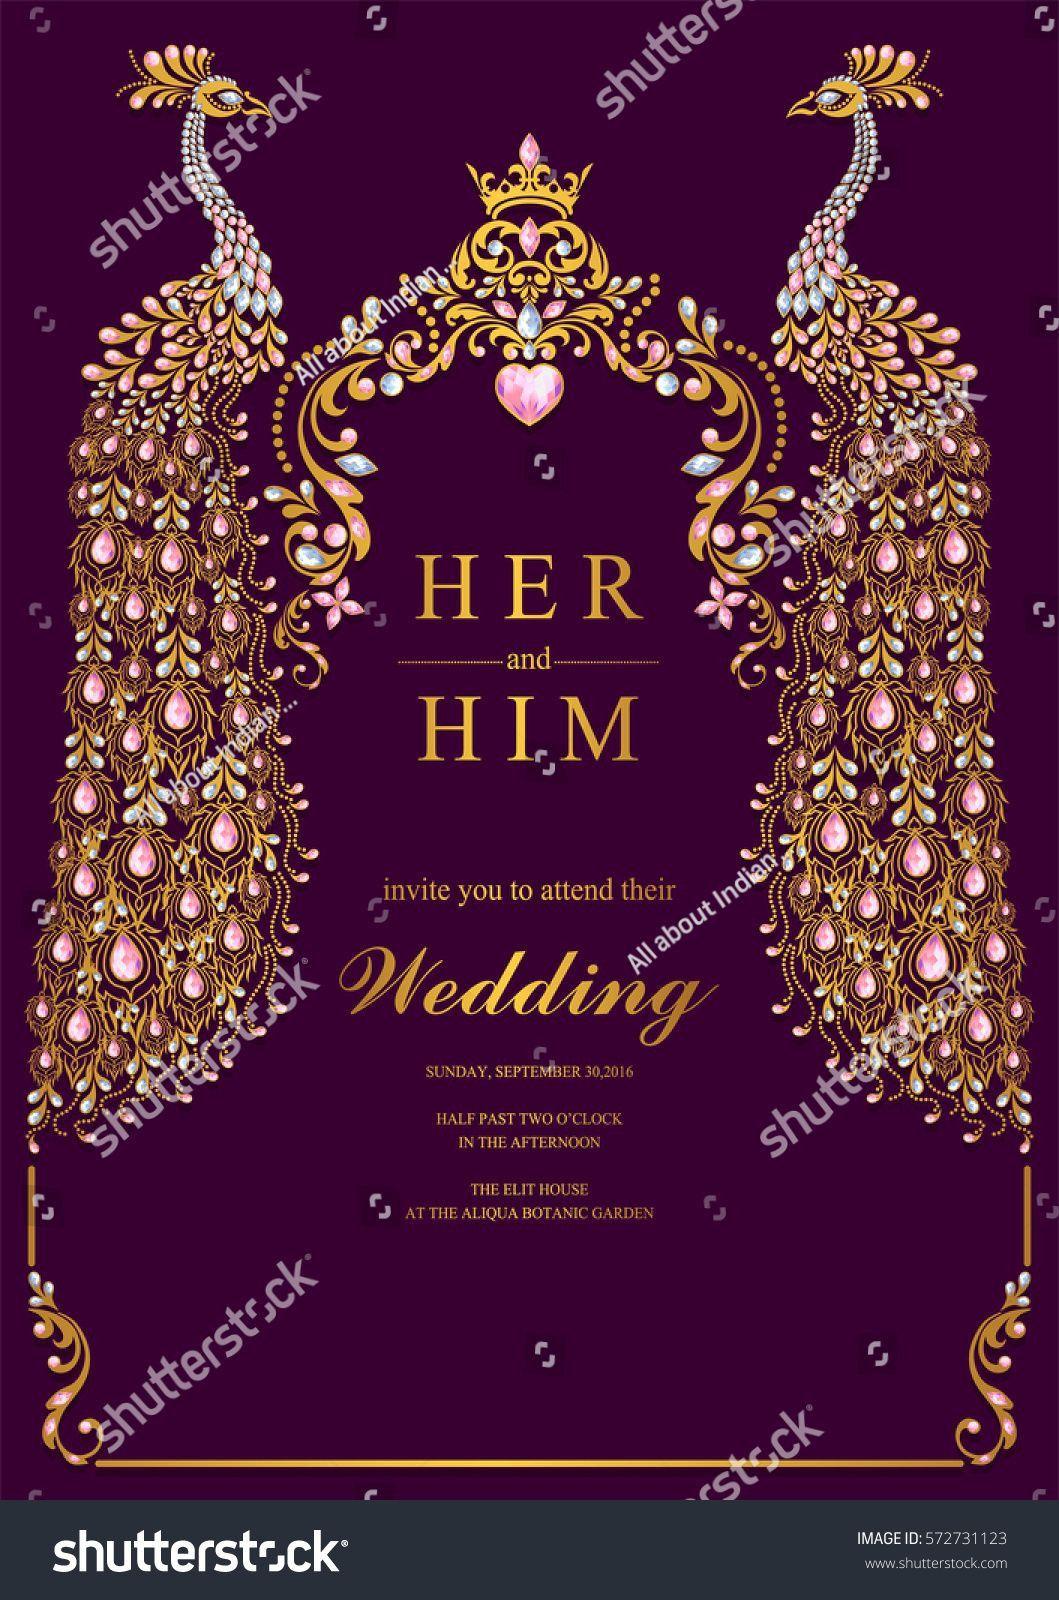 Peacock Wedding Invitation Templates Indian Wedding Invitations Indian Wedding Invitation Cards Indian Wedding Cards